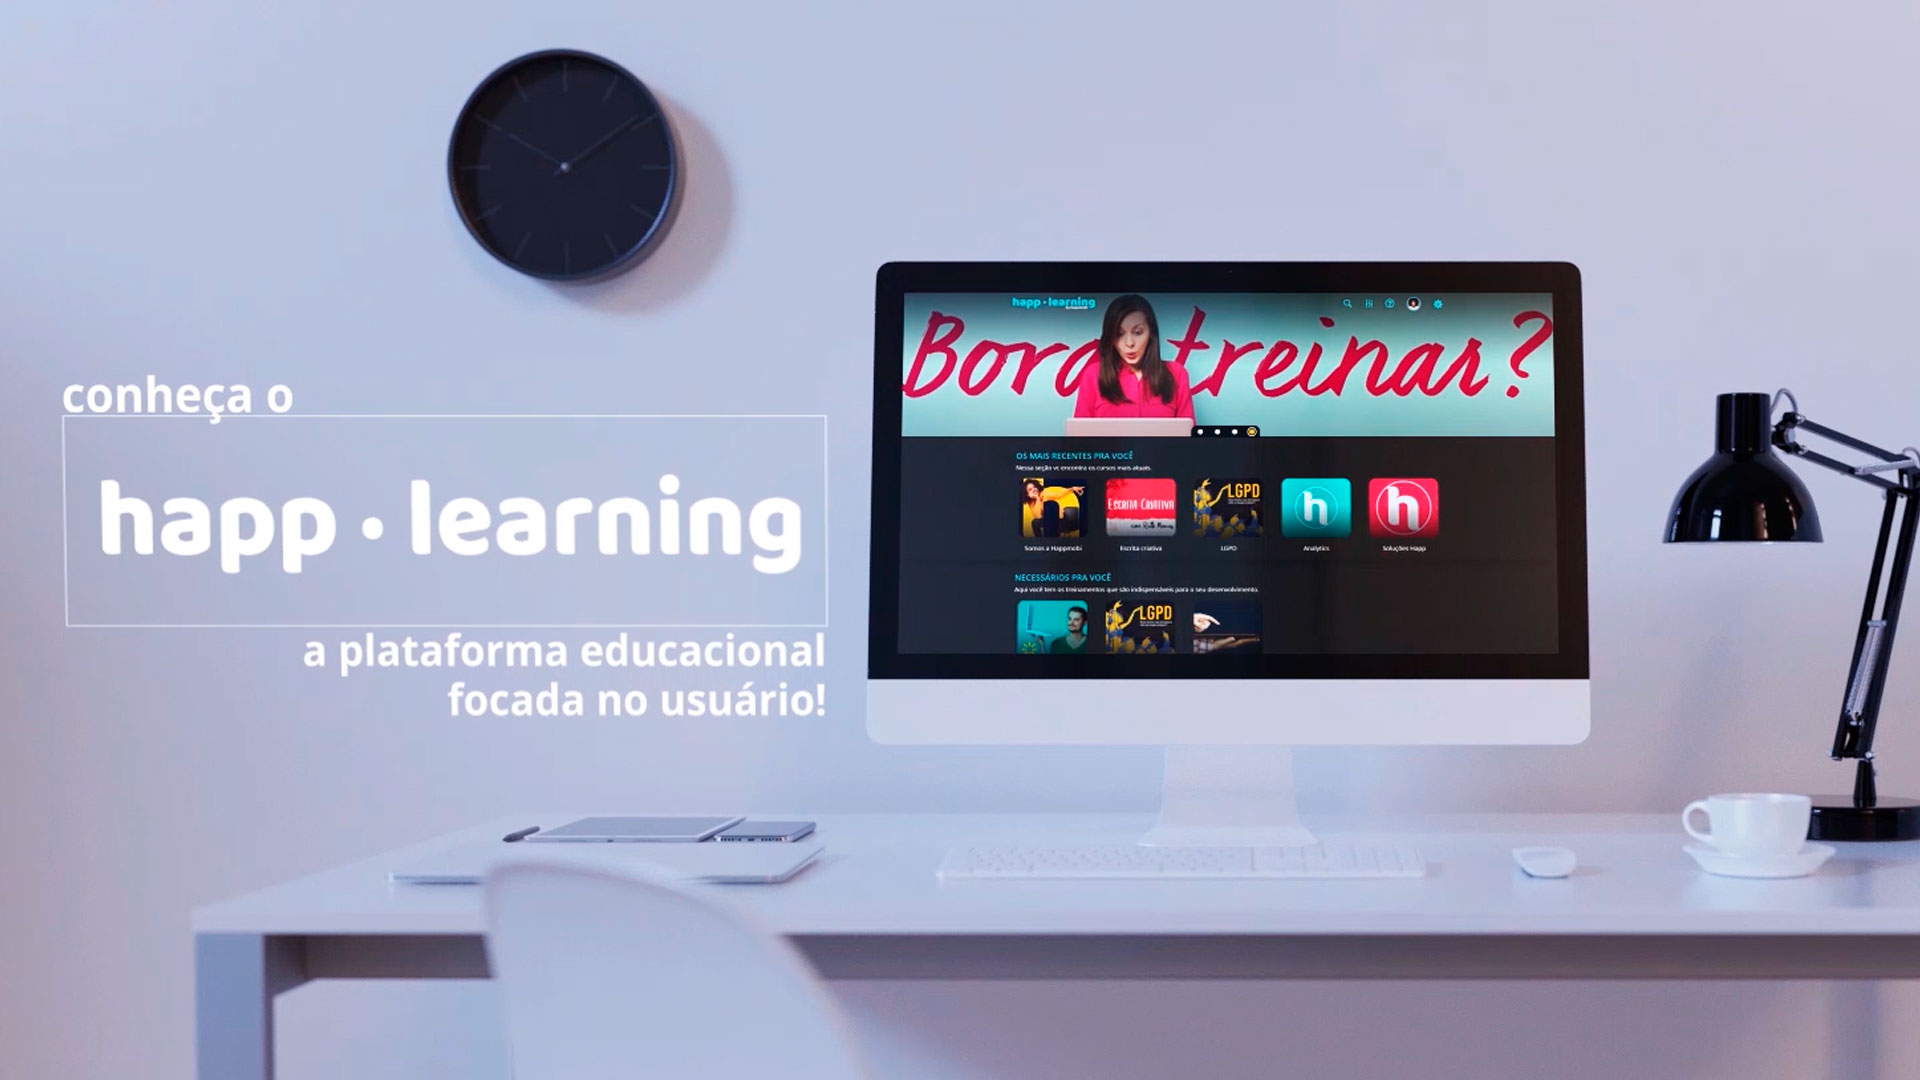 Happ Learning - Conheça a plataforma educacional da Happmobi